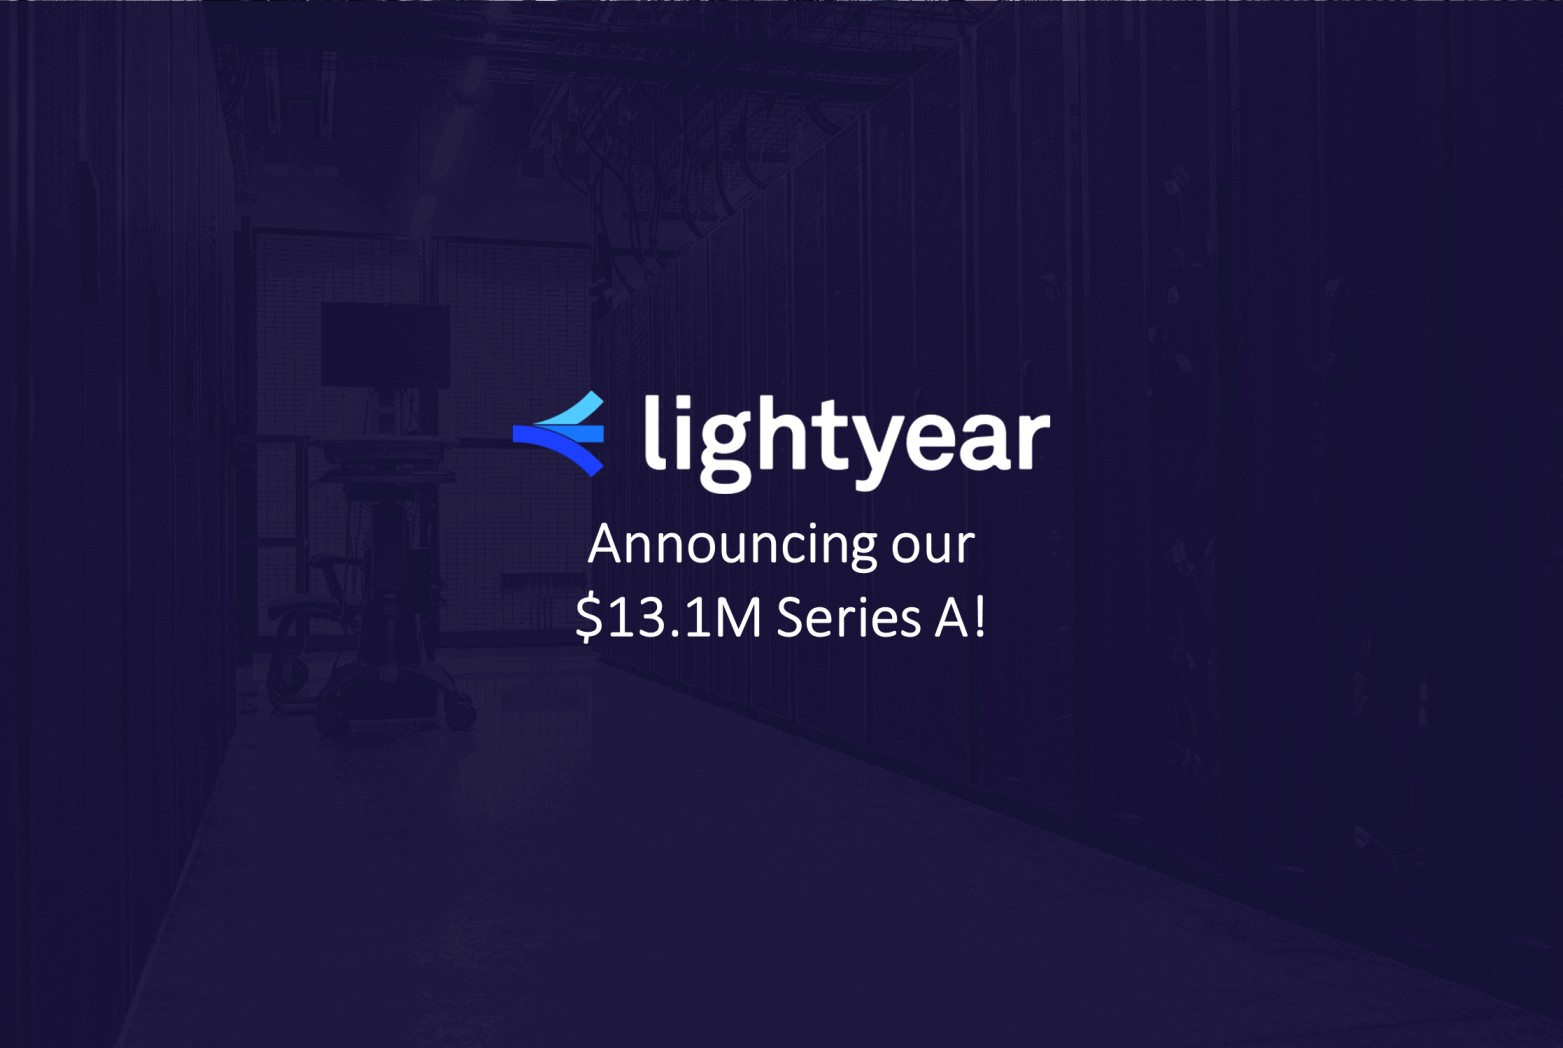 lightyear series A